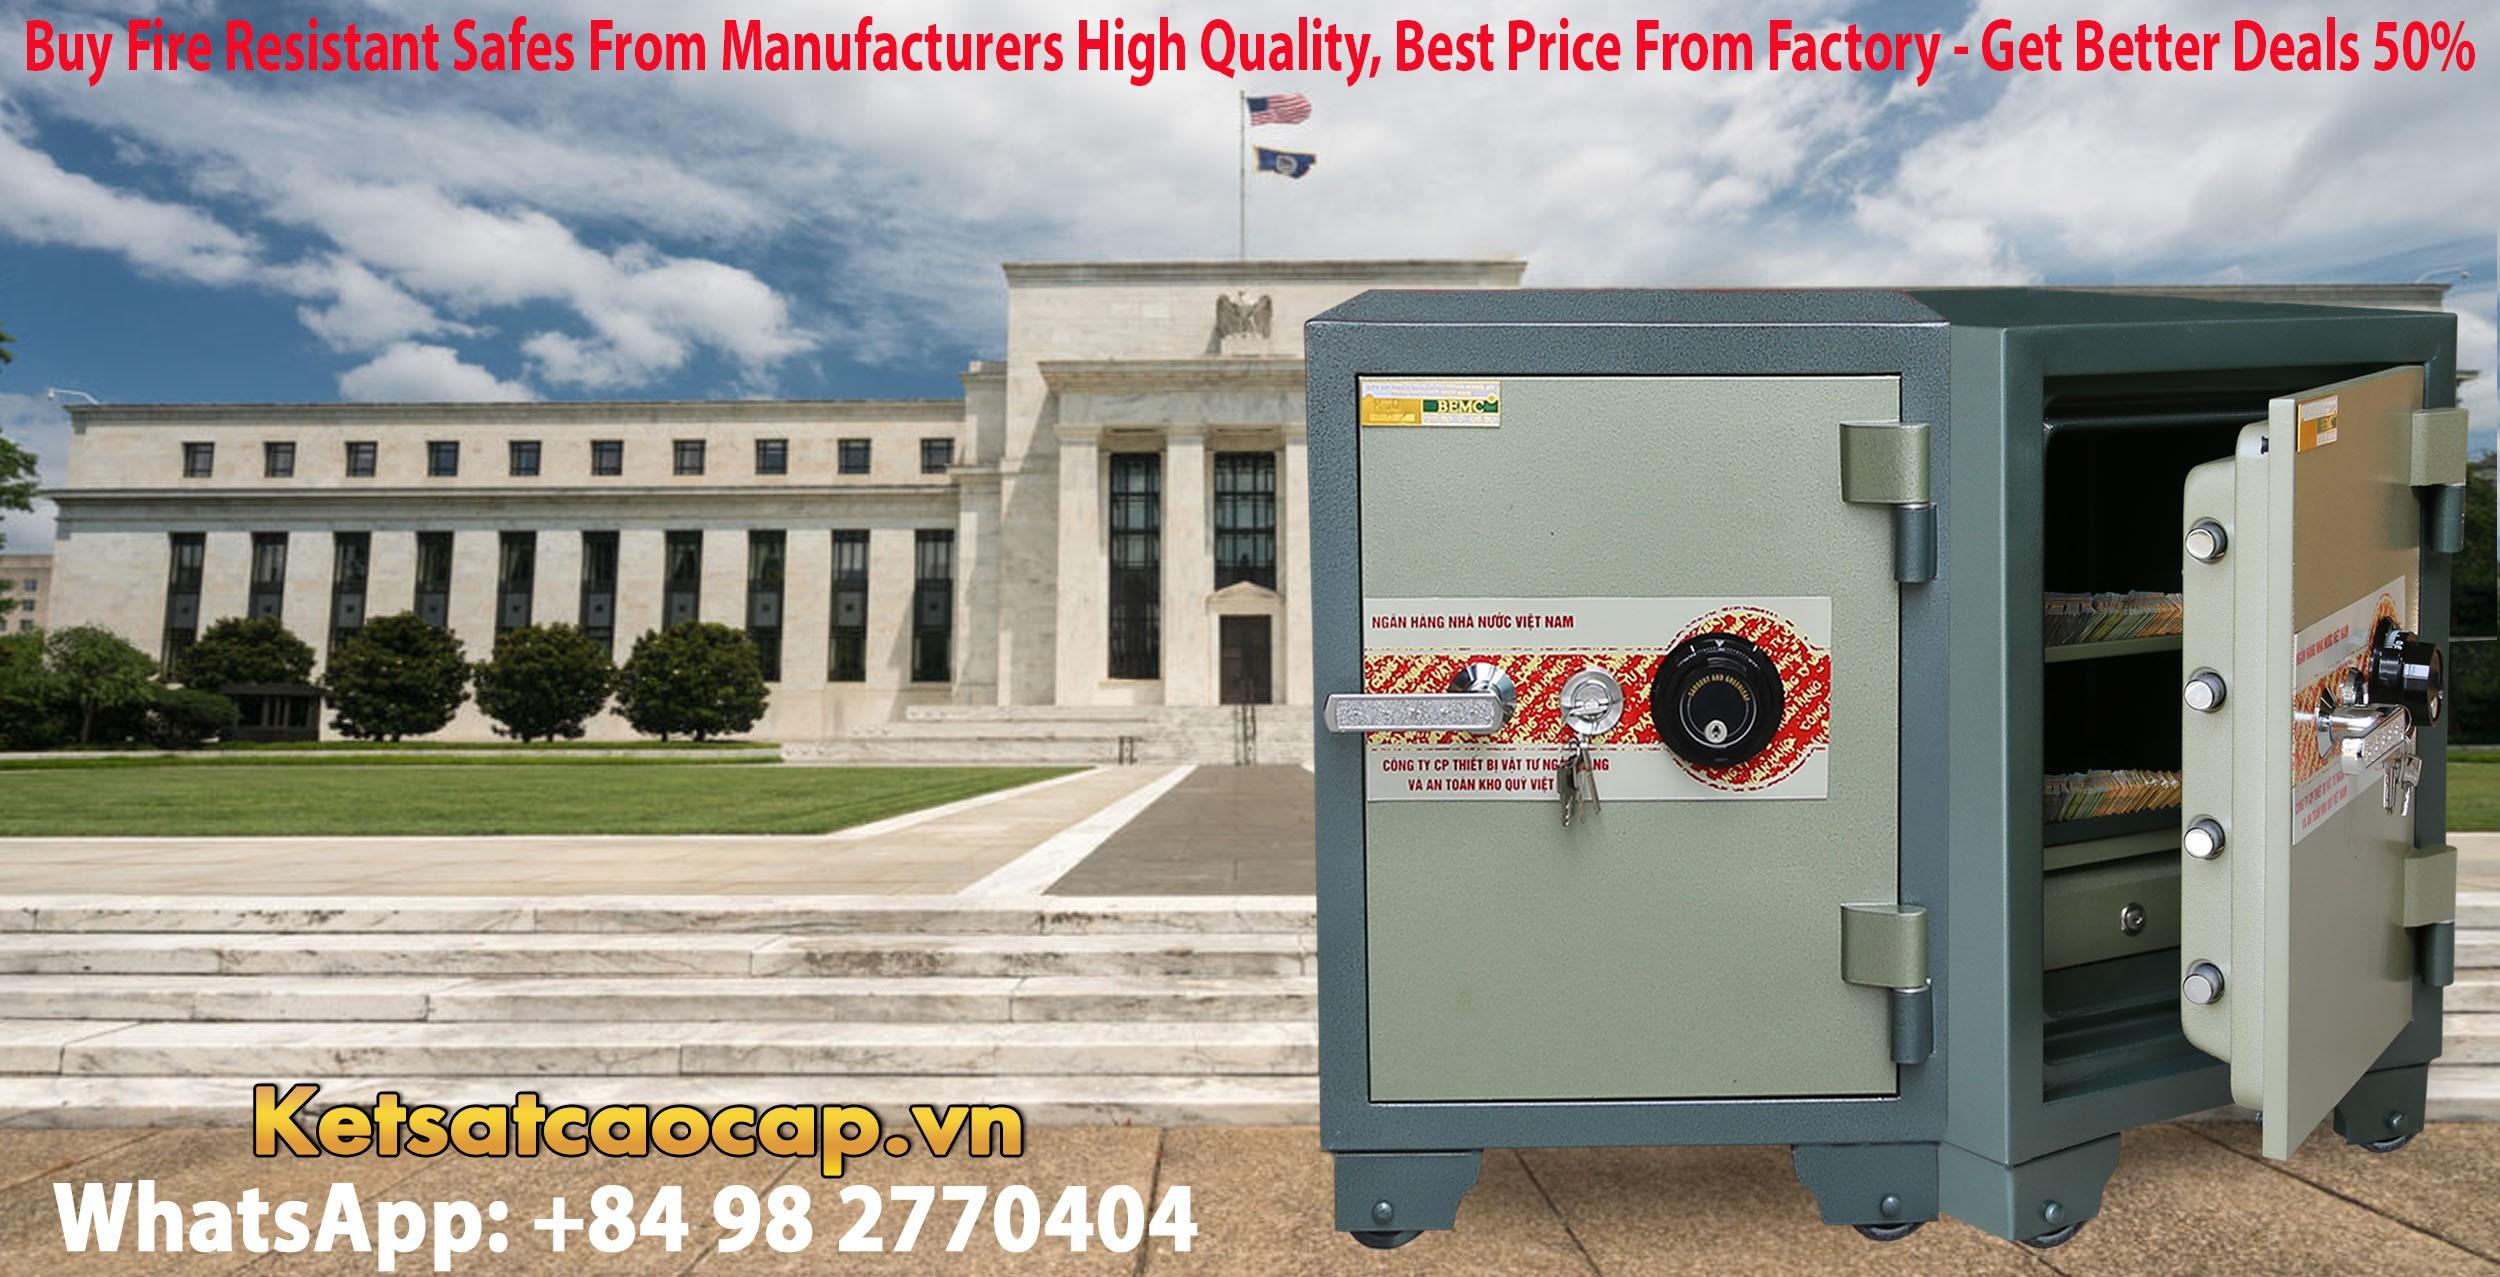 hình ảnh sản phẩm Bank Safes LX650 DK Customized Bank Safes Factory Price For Wholesale